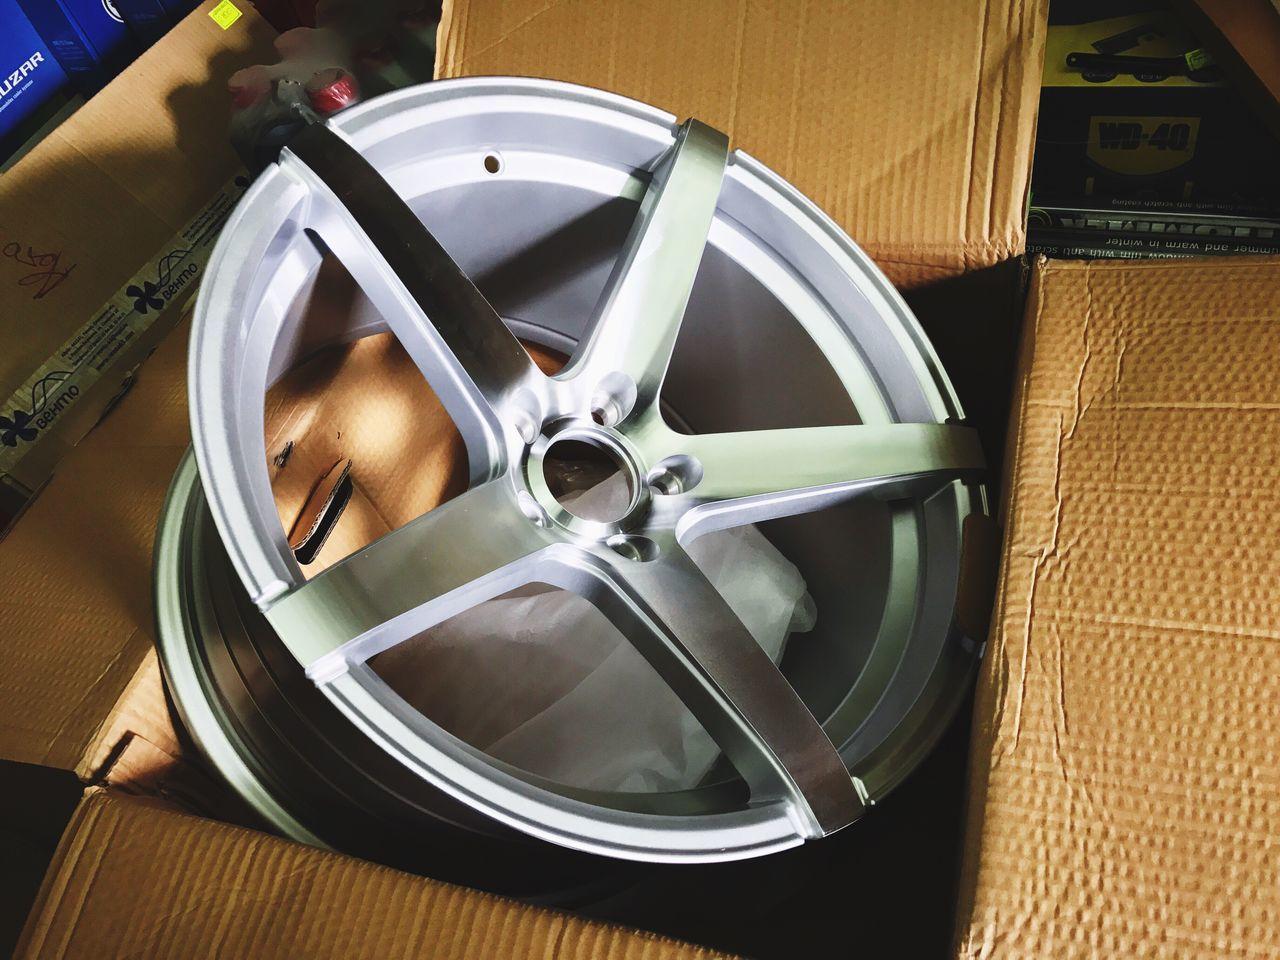 Baldirowheels Wheels Drive2 Smotra Baldirowheels Volgograd Stance Lowcars